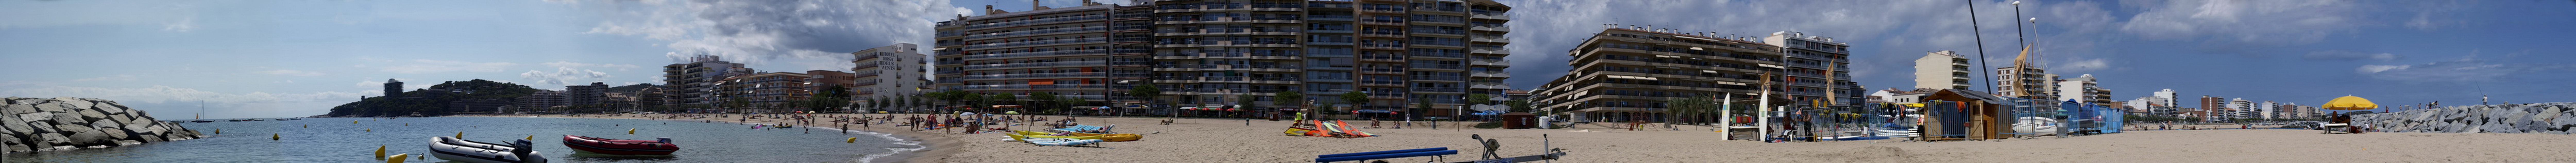 Foto playa Cala de la Roca del Paller. Sat Antoni de Calonge